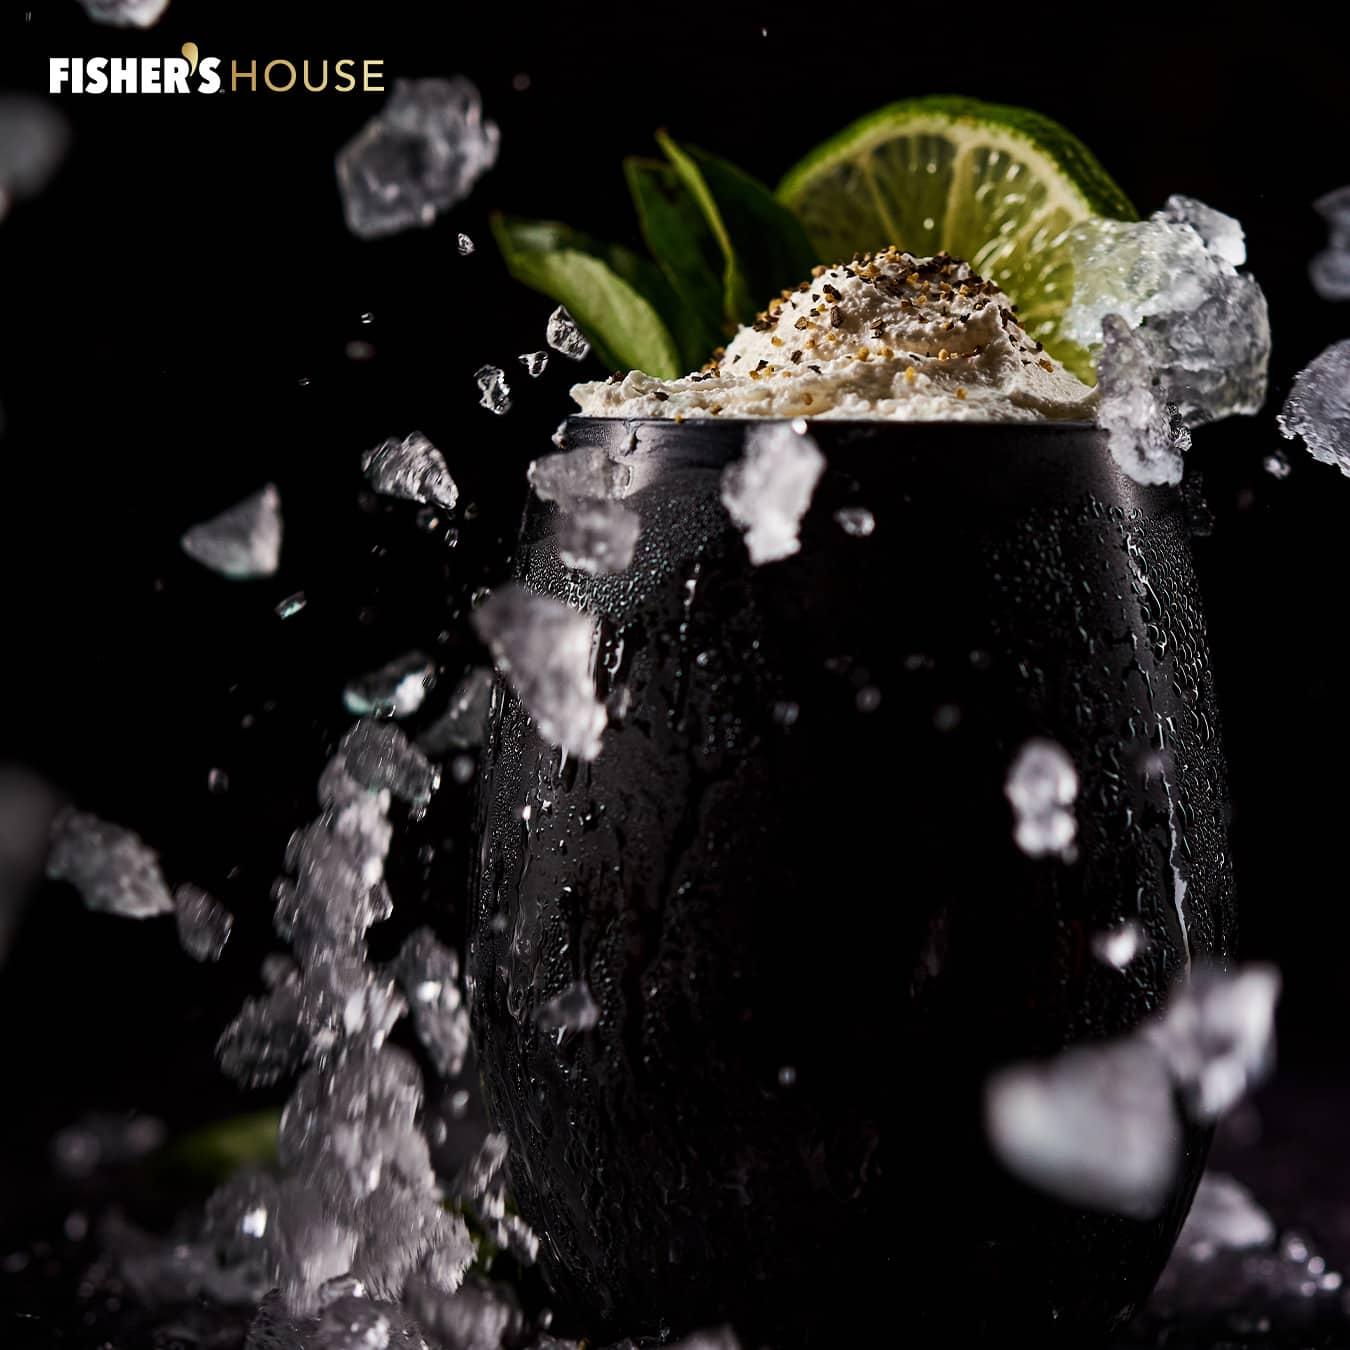 Restaurante Fishers house en México